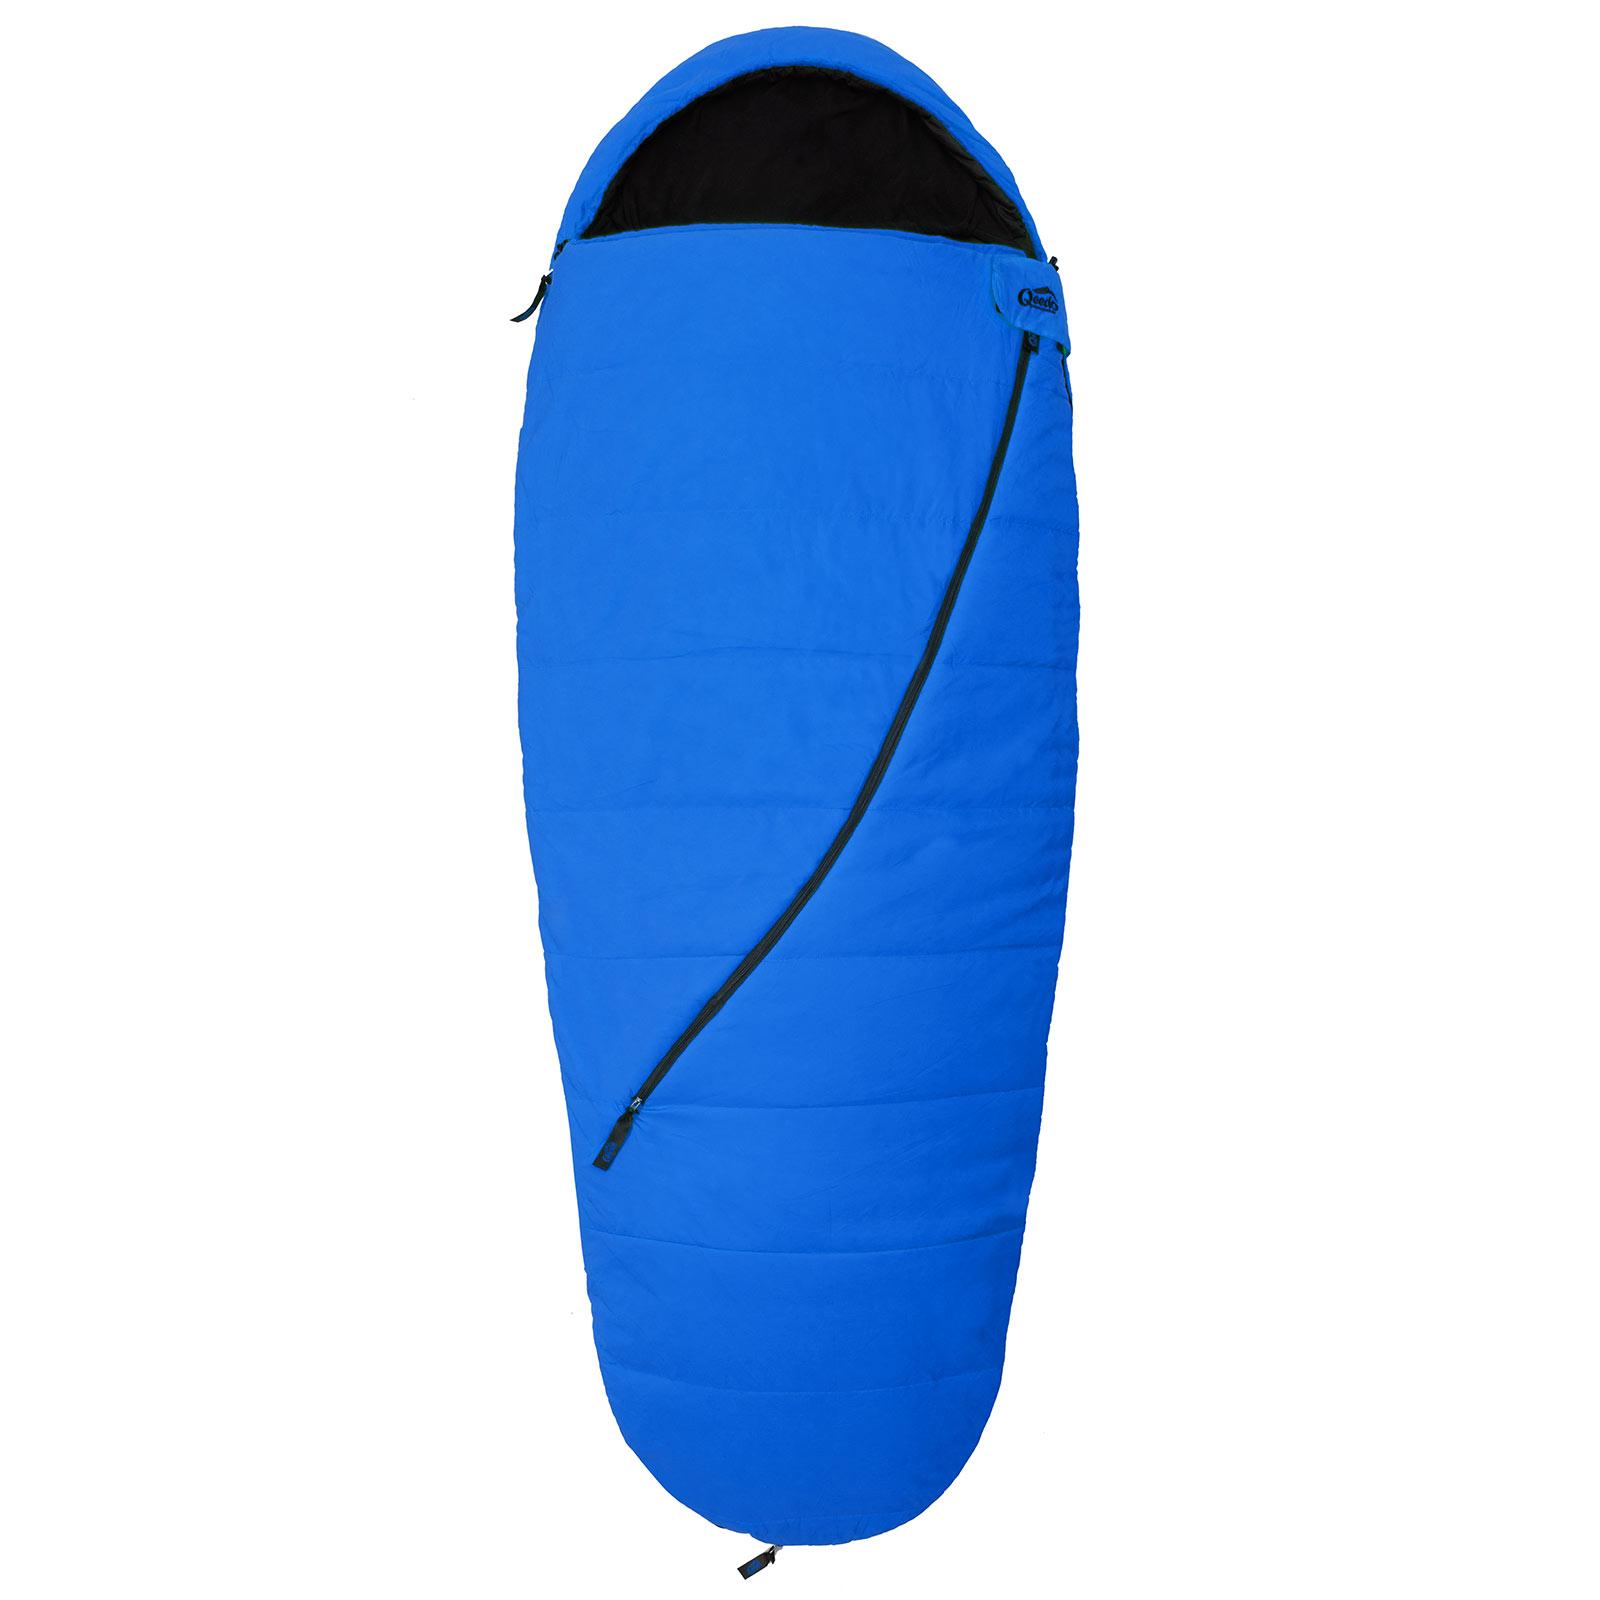 schlafsack camping qeedo buddy blau mumien schlafsack. Black Bedroom Furniture Sets. Home Design Ideas